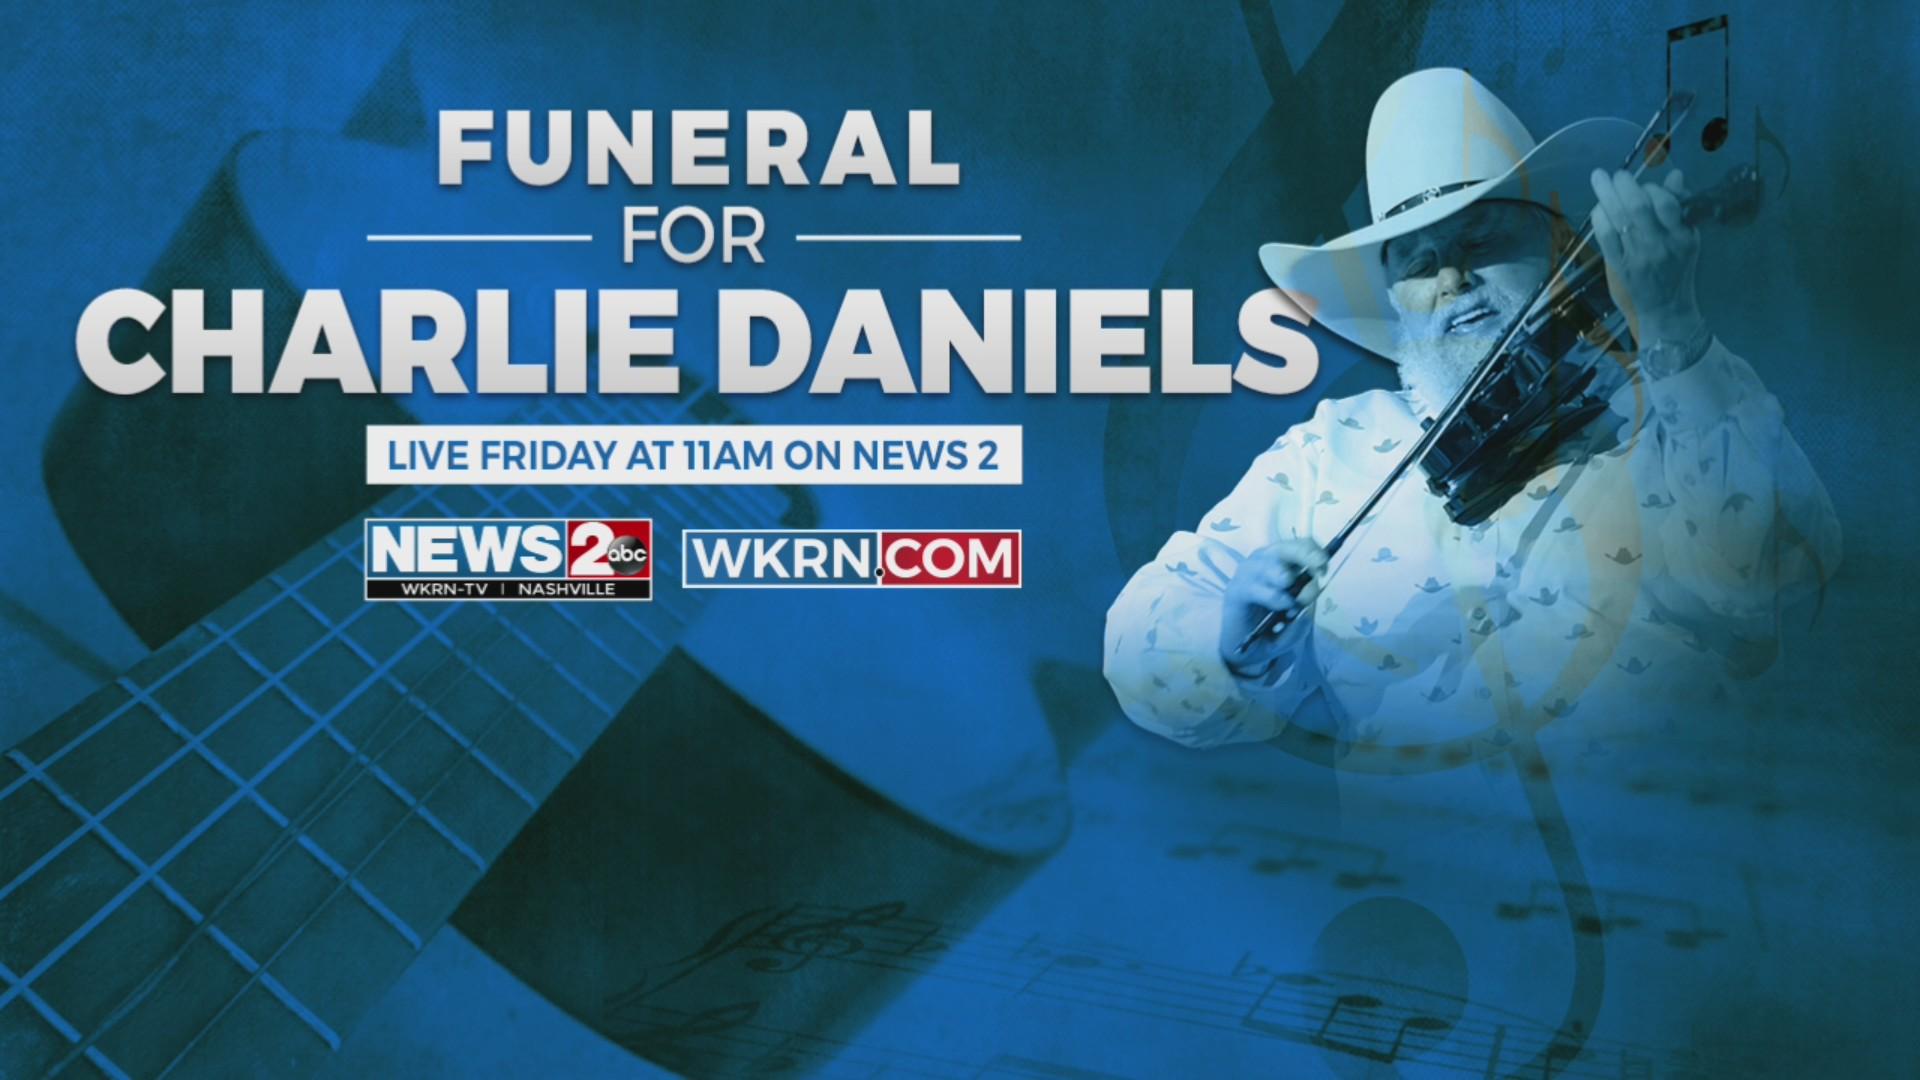 Charlie Daniels funeral